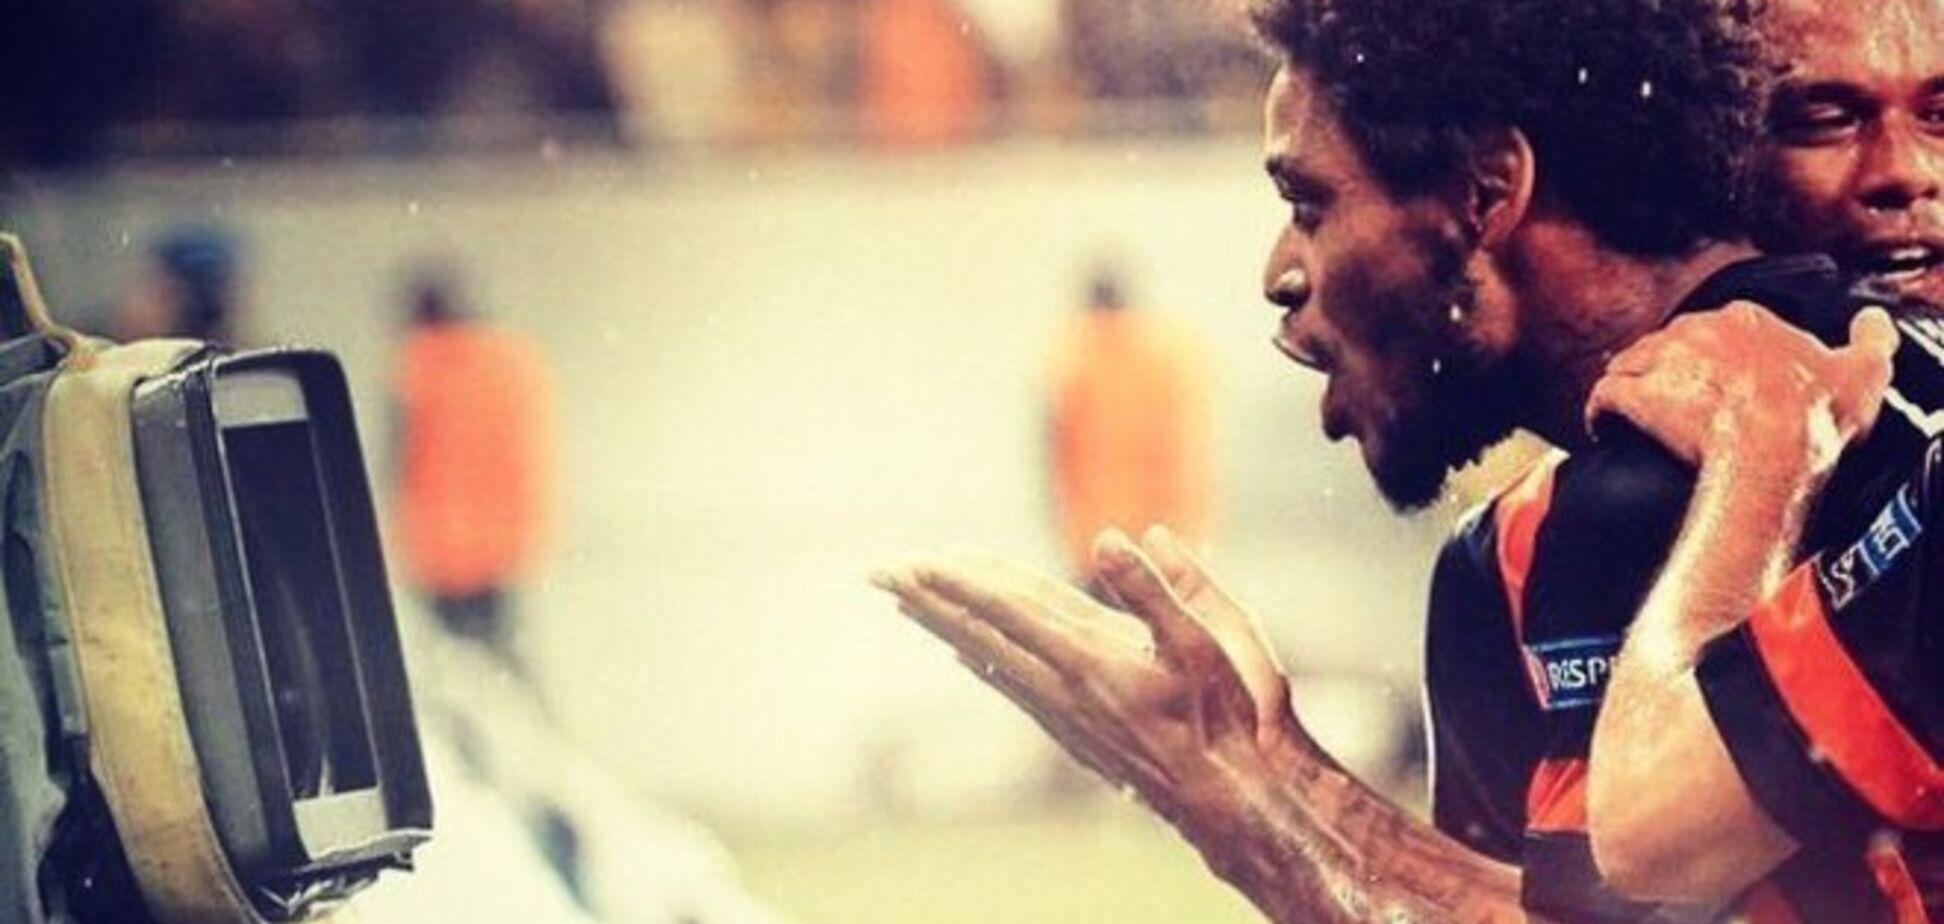 Нападающий 'Шахтера' установил рекорд Лиги чемпионов